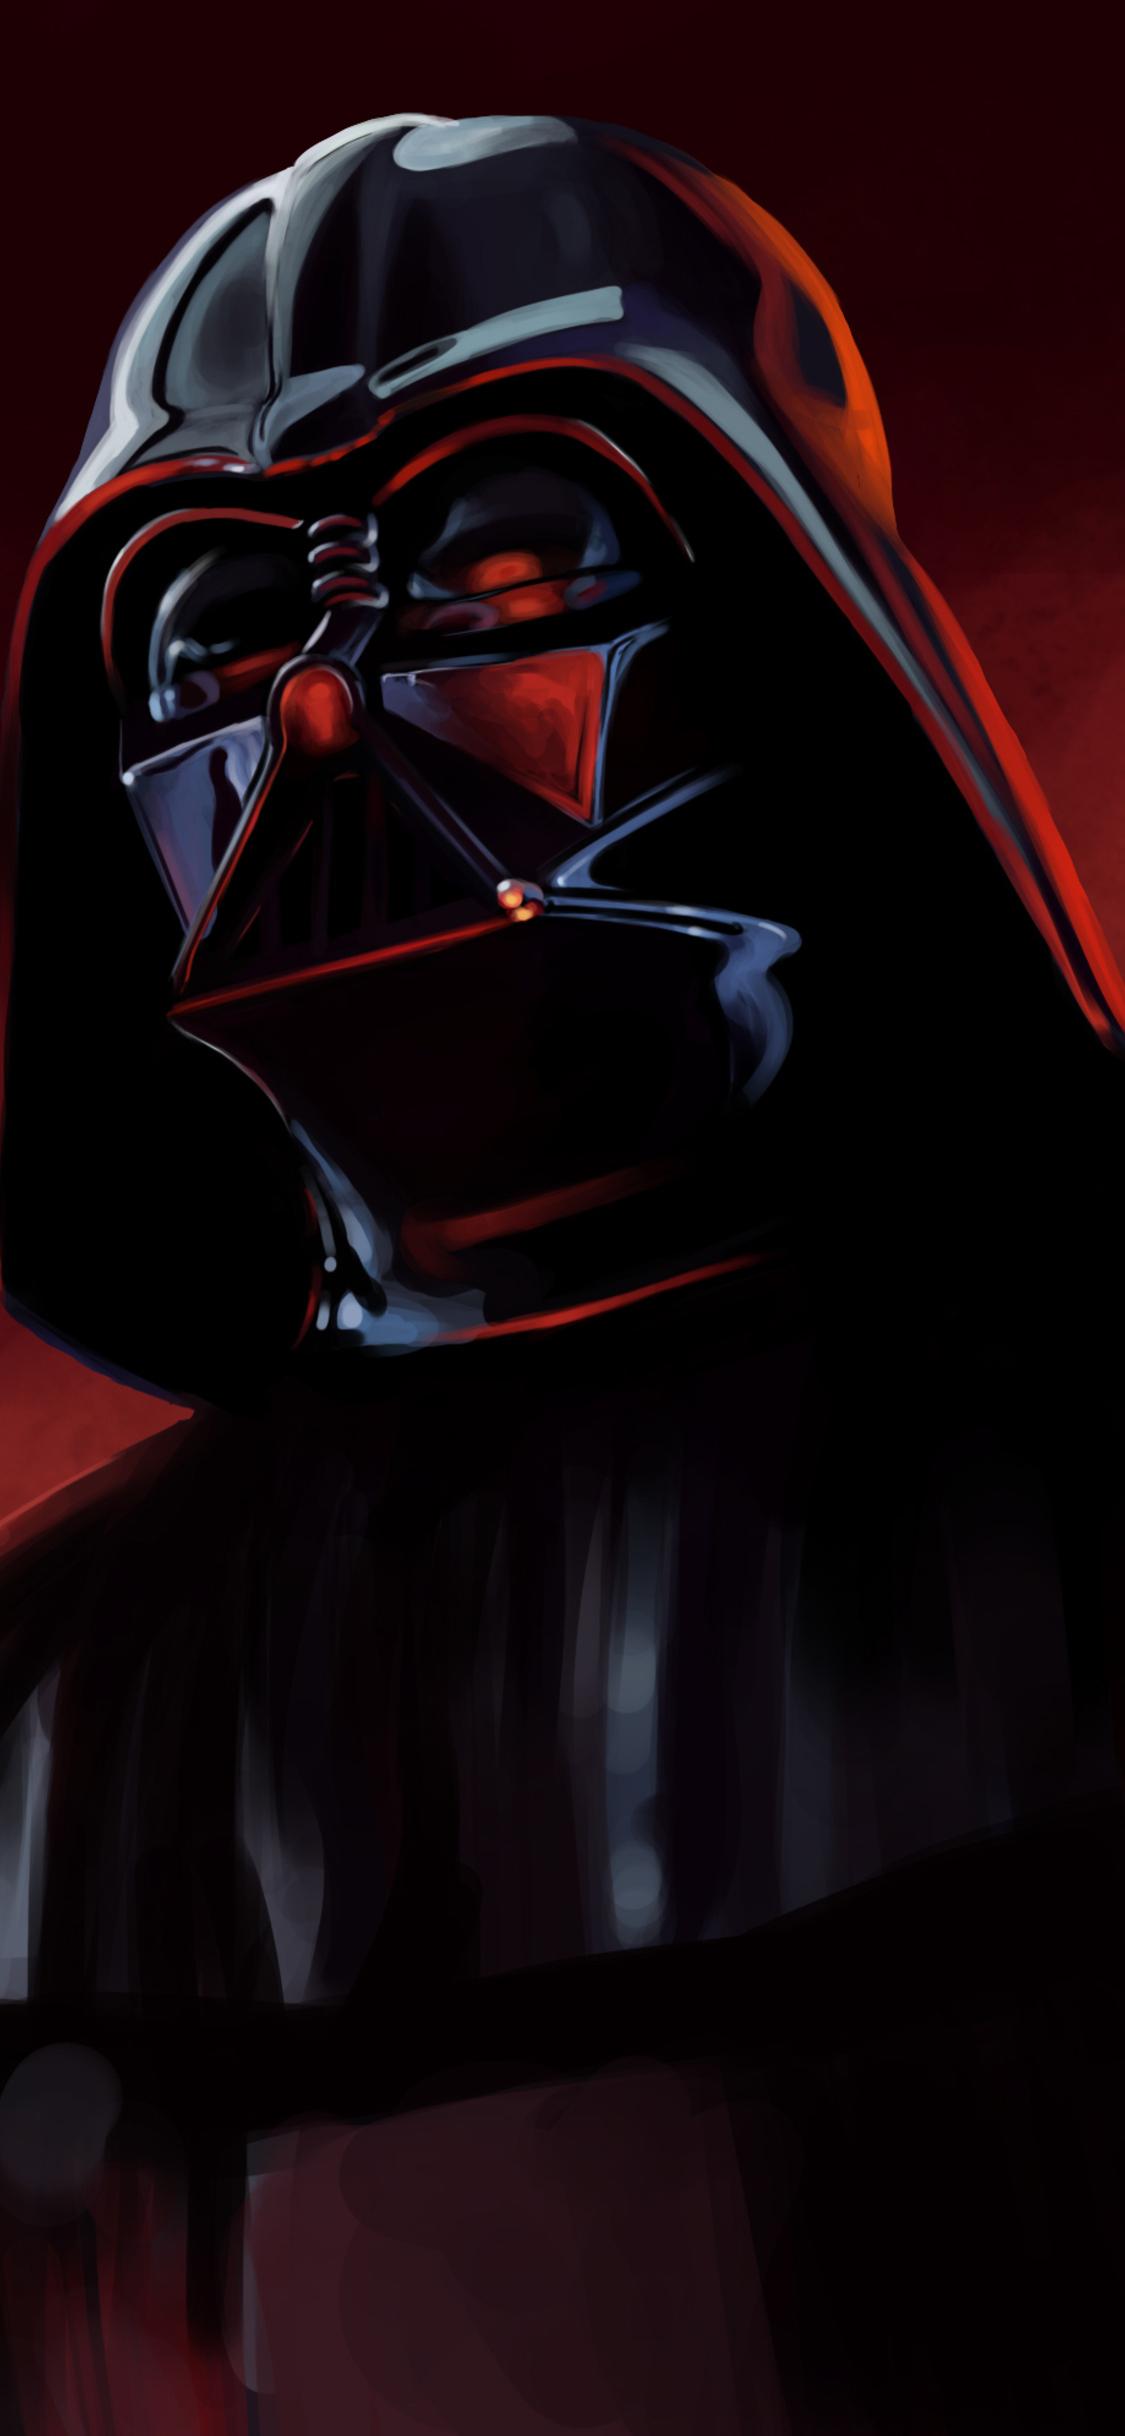 Darth Vader Star Iphone X Wallpaper Telecharger Gratuites